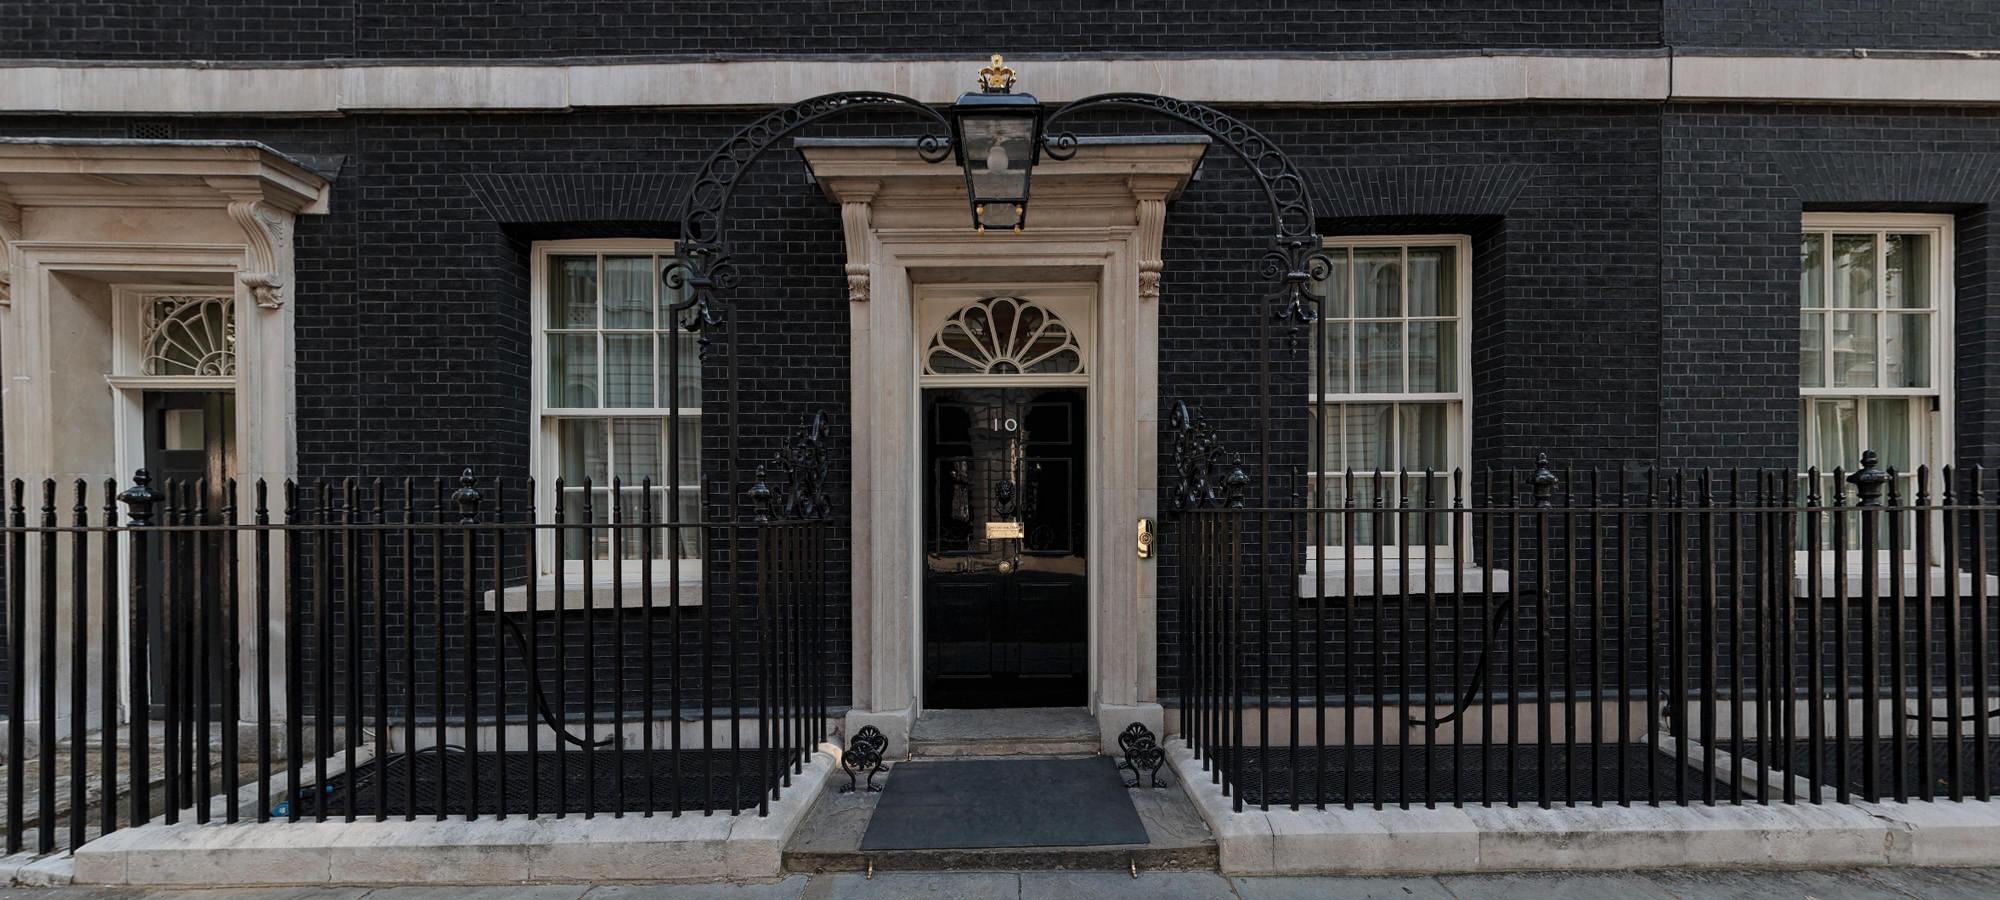 Get inside 10 Downing Street